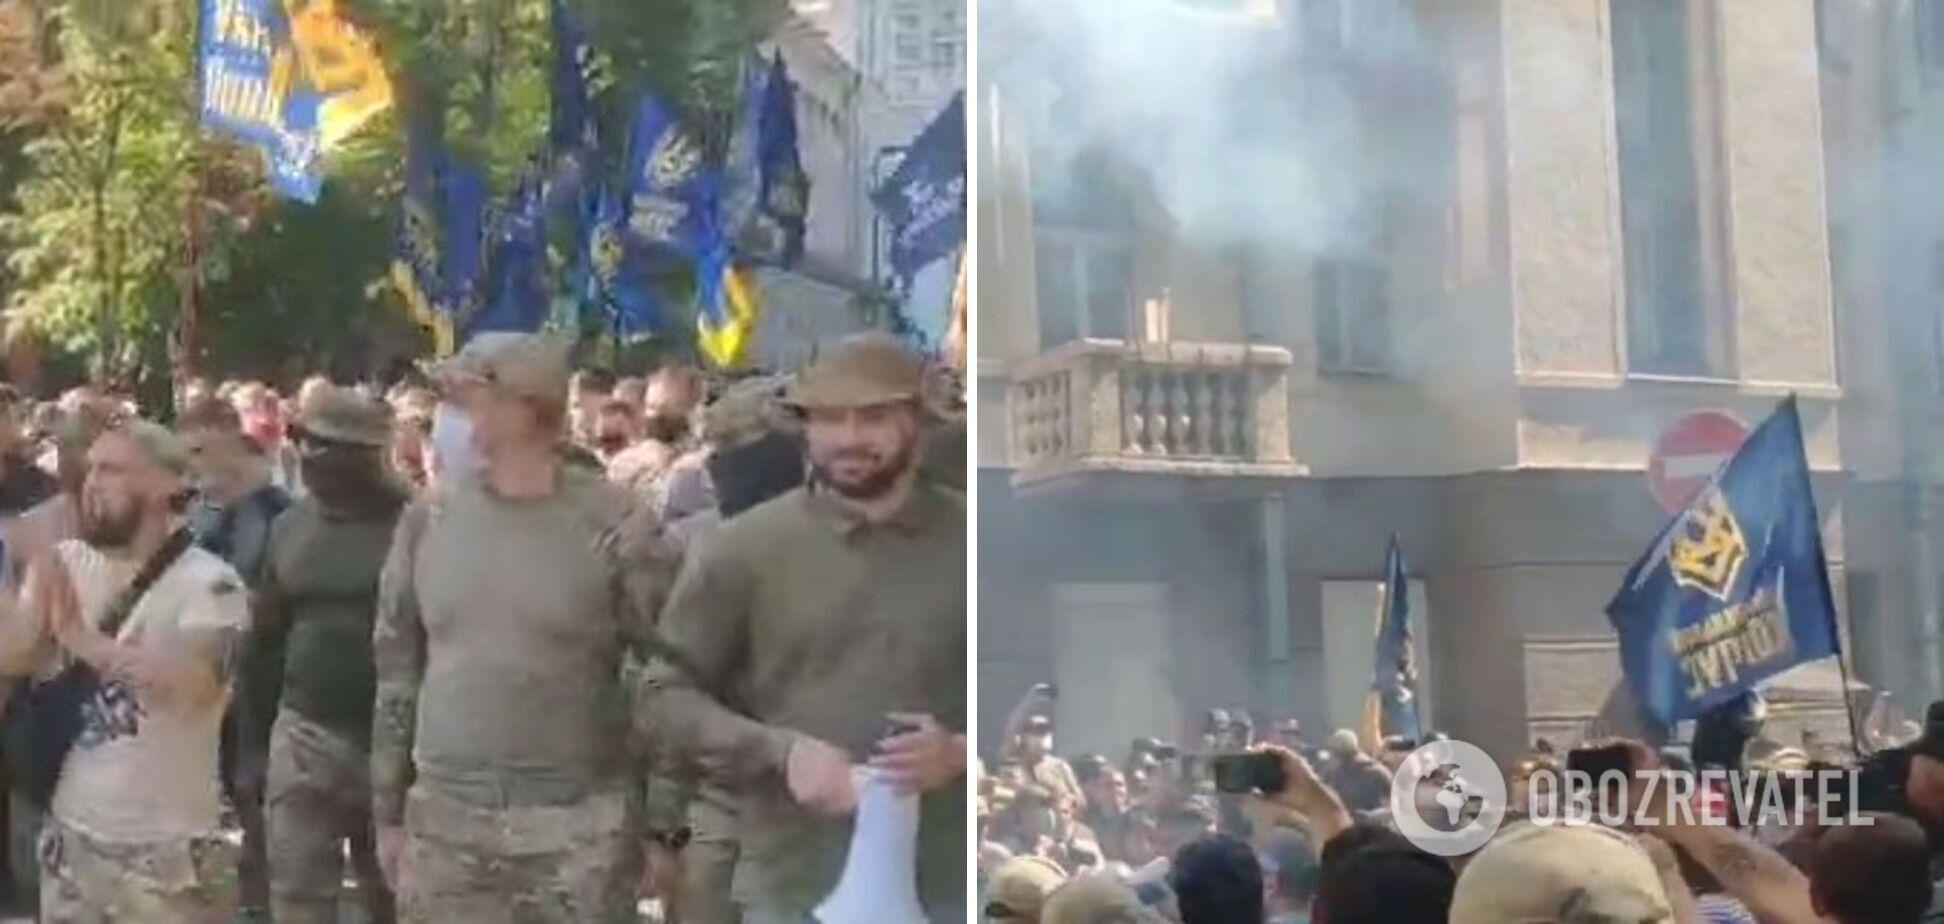 Активисты протестовали возле дома Зеленского